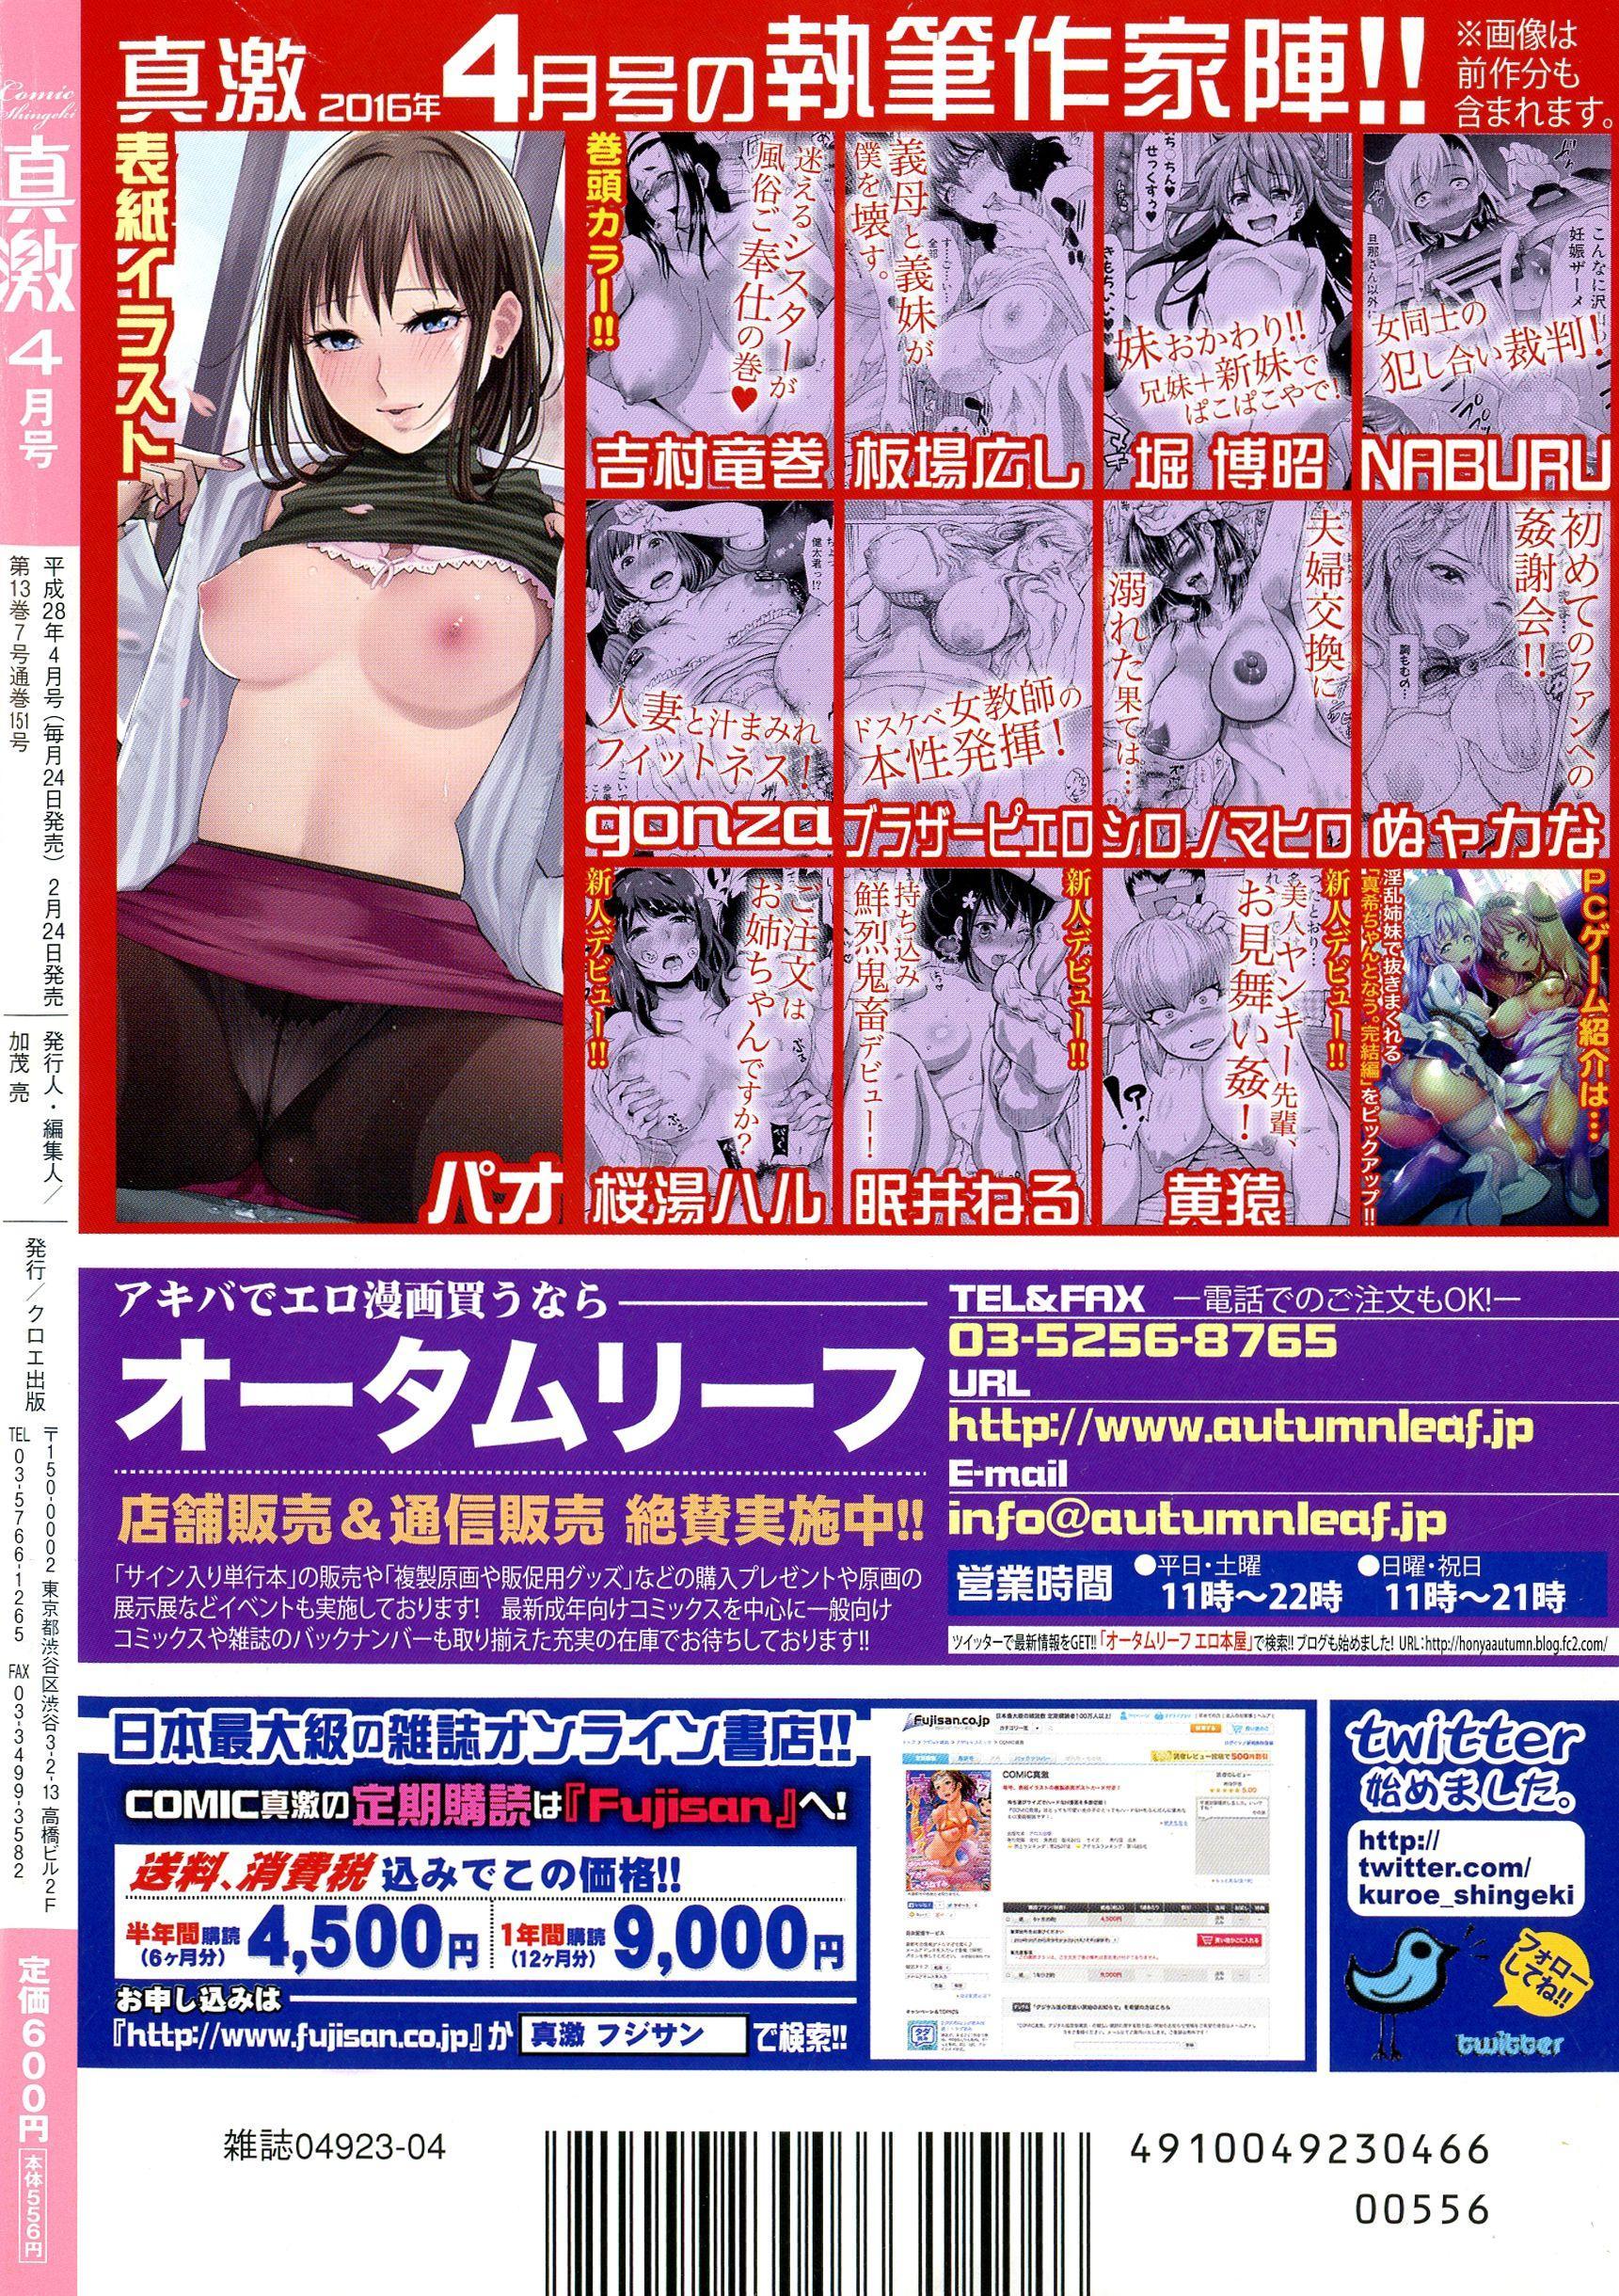 COMIC Shingeki 2016-04 1